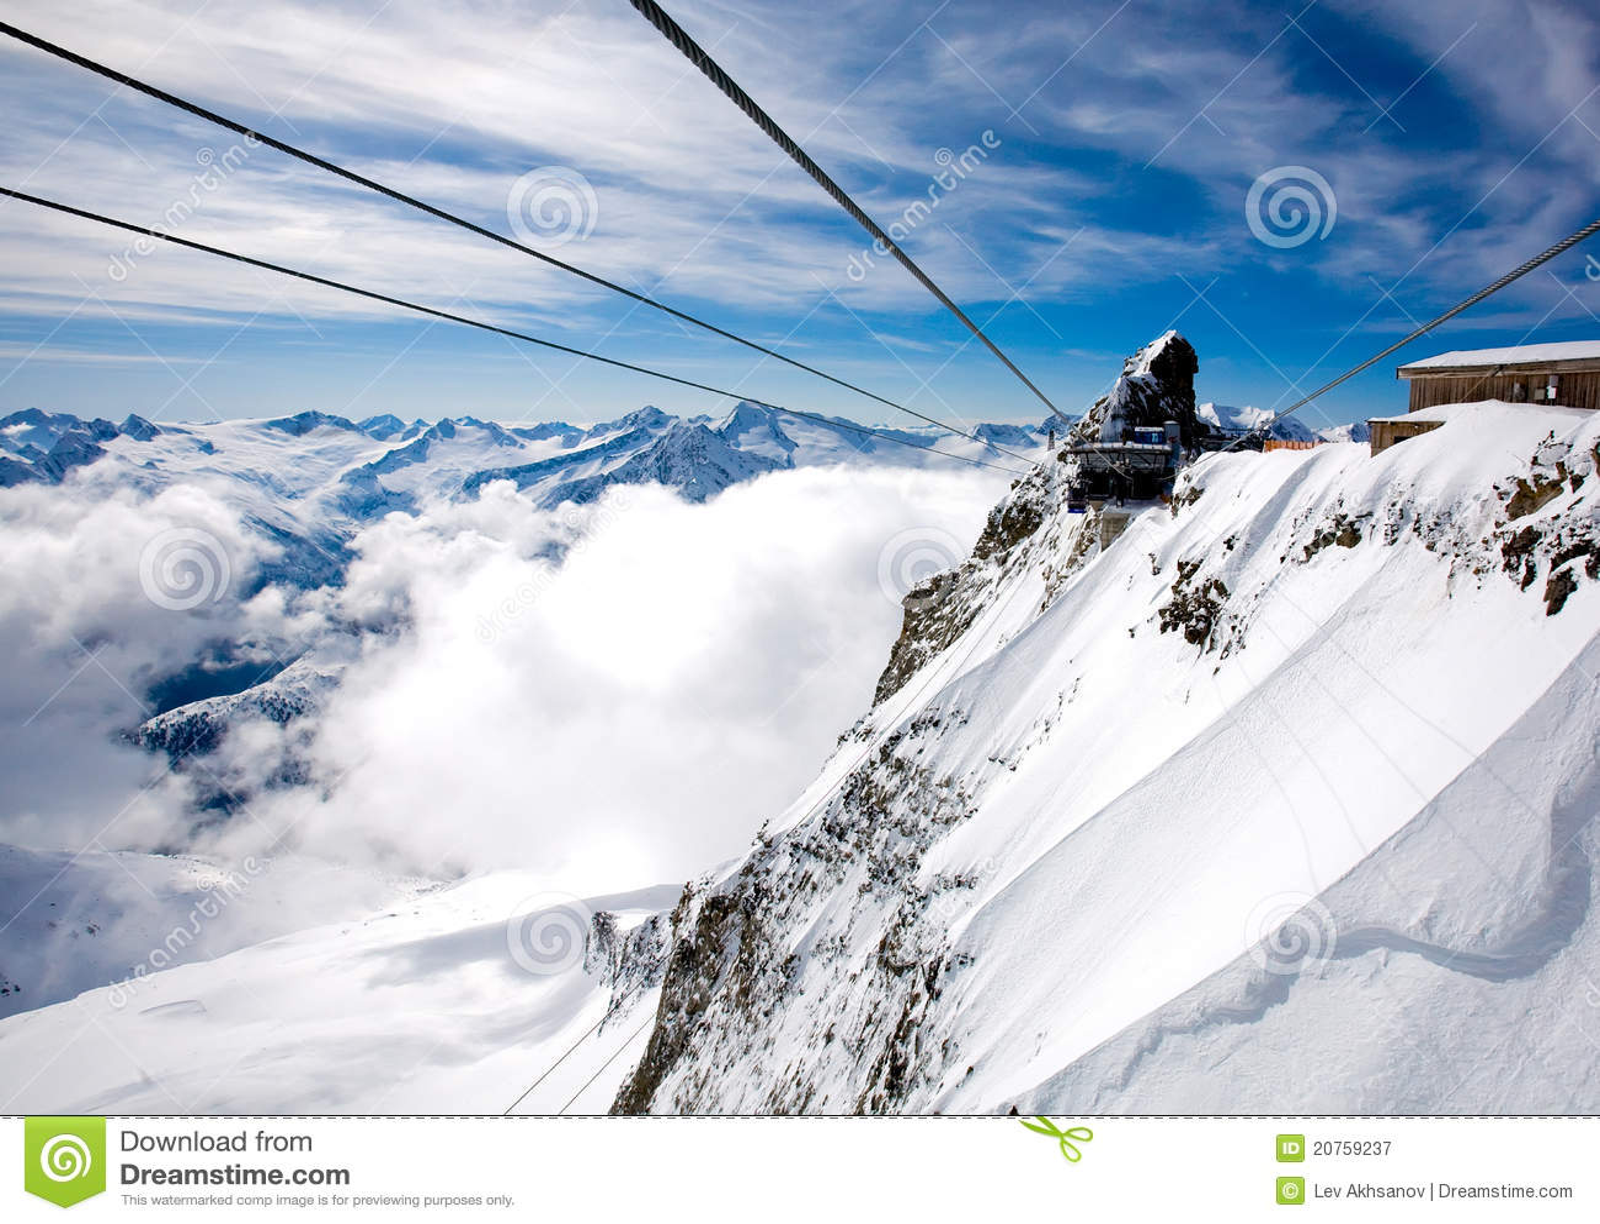 Hintertux Glacier Austria  city photo : Cables and gandola station at Hintertux Glacier in Zillertal, Austria.